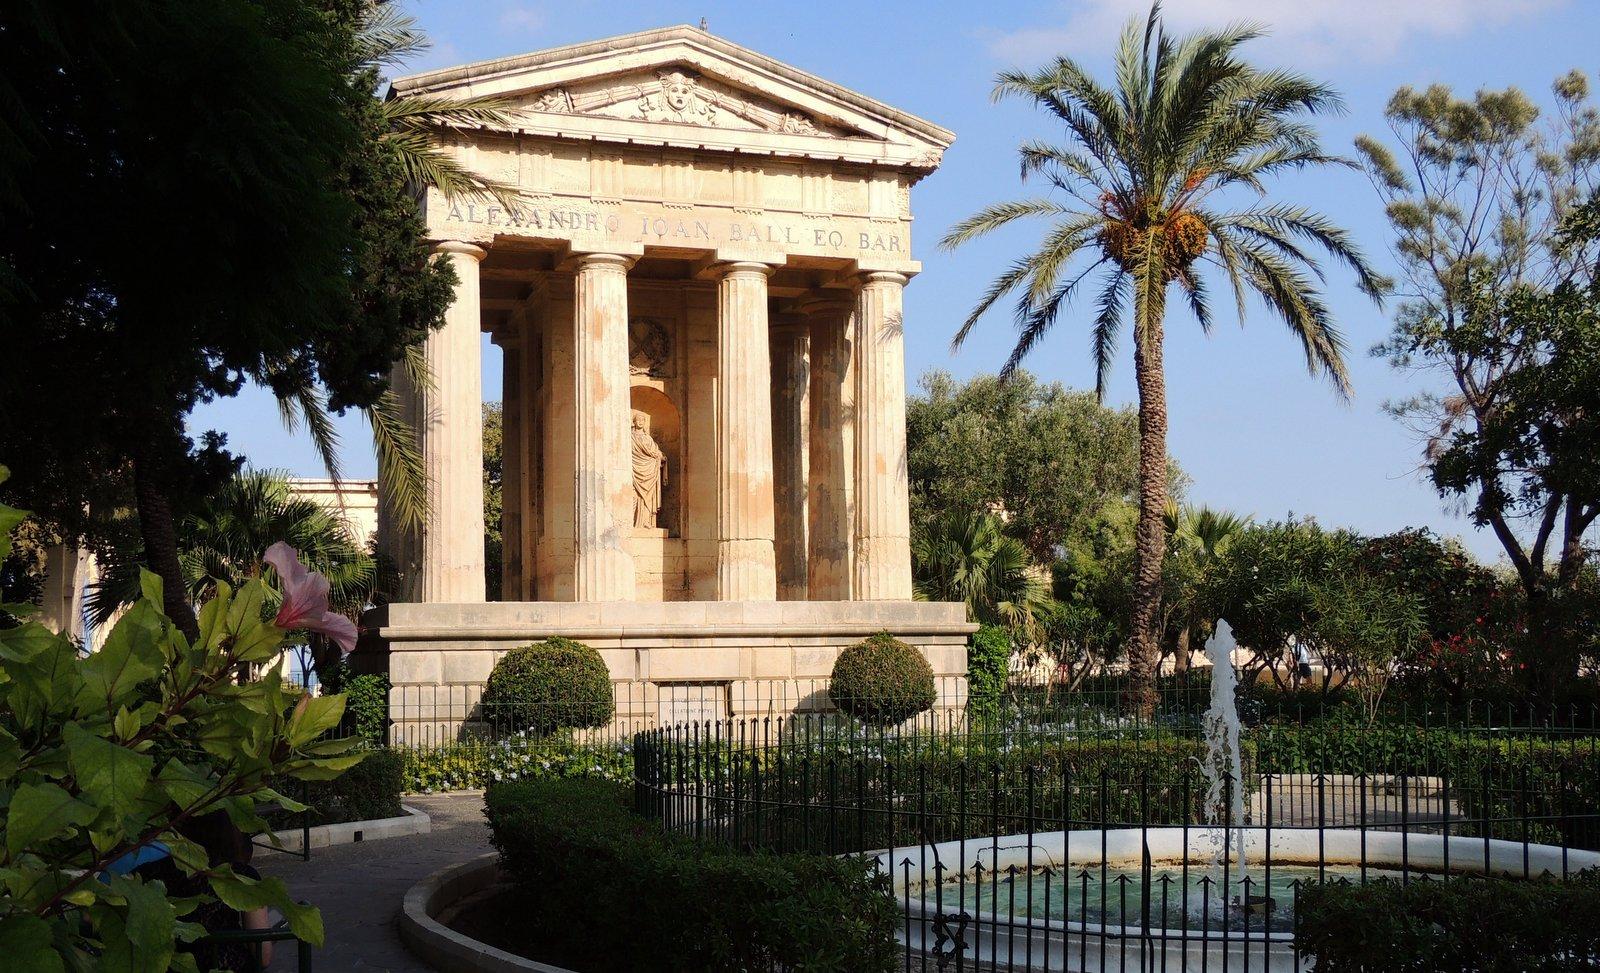 Lower Barakka Gardens - Malta